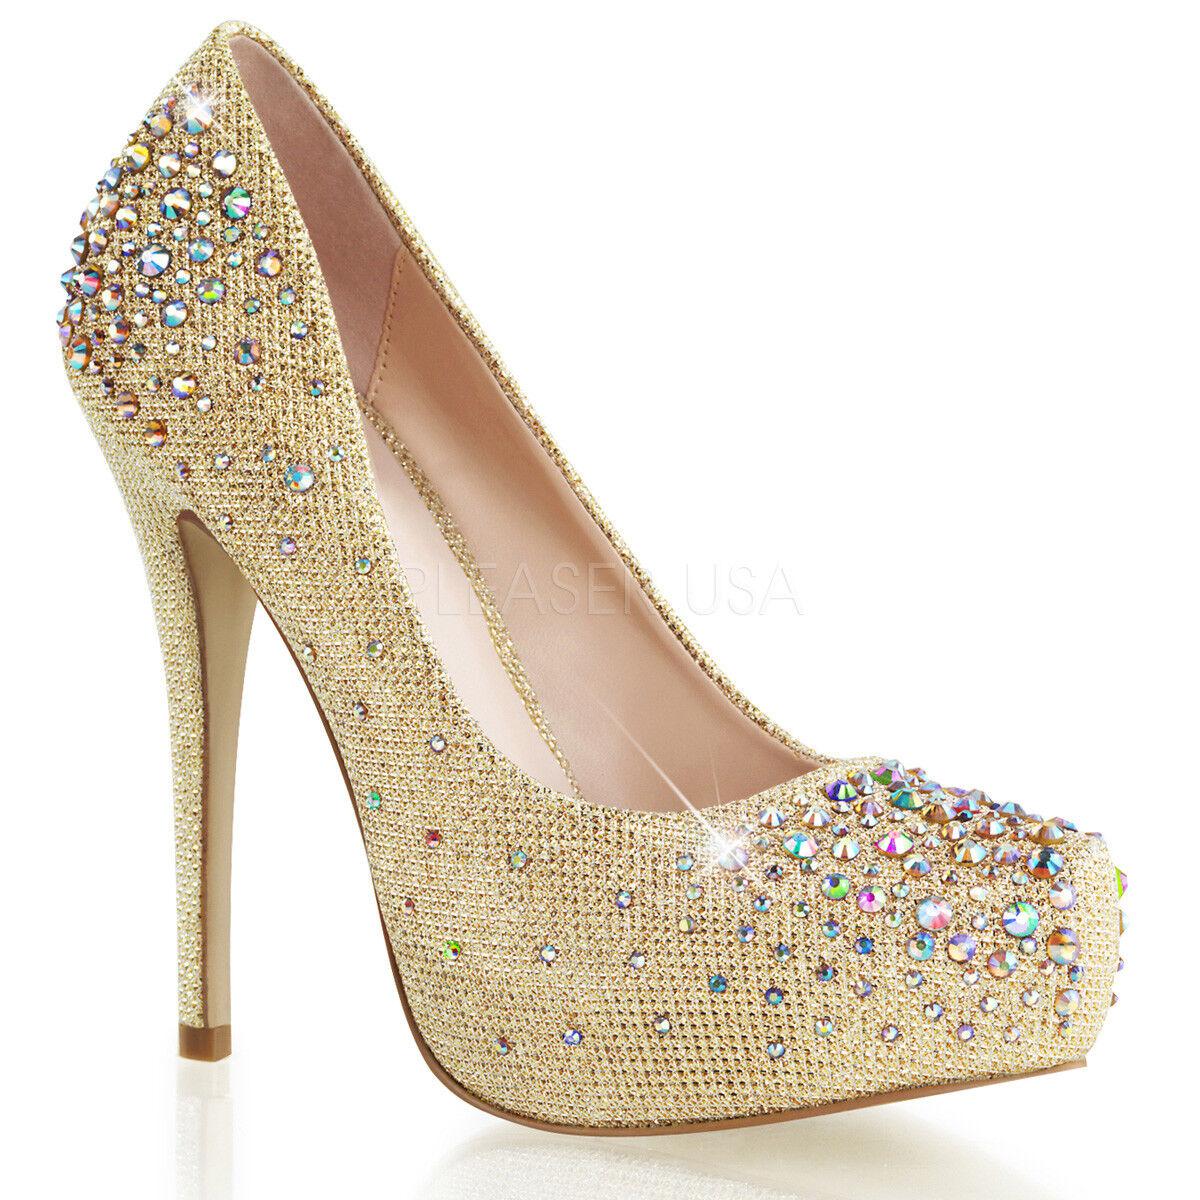 Fabulicious DESTINY-06R Womens Nude Glitter Mesh Fabric High Heel Platform Pumps